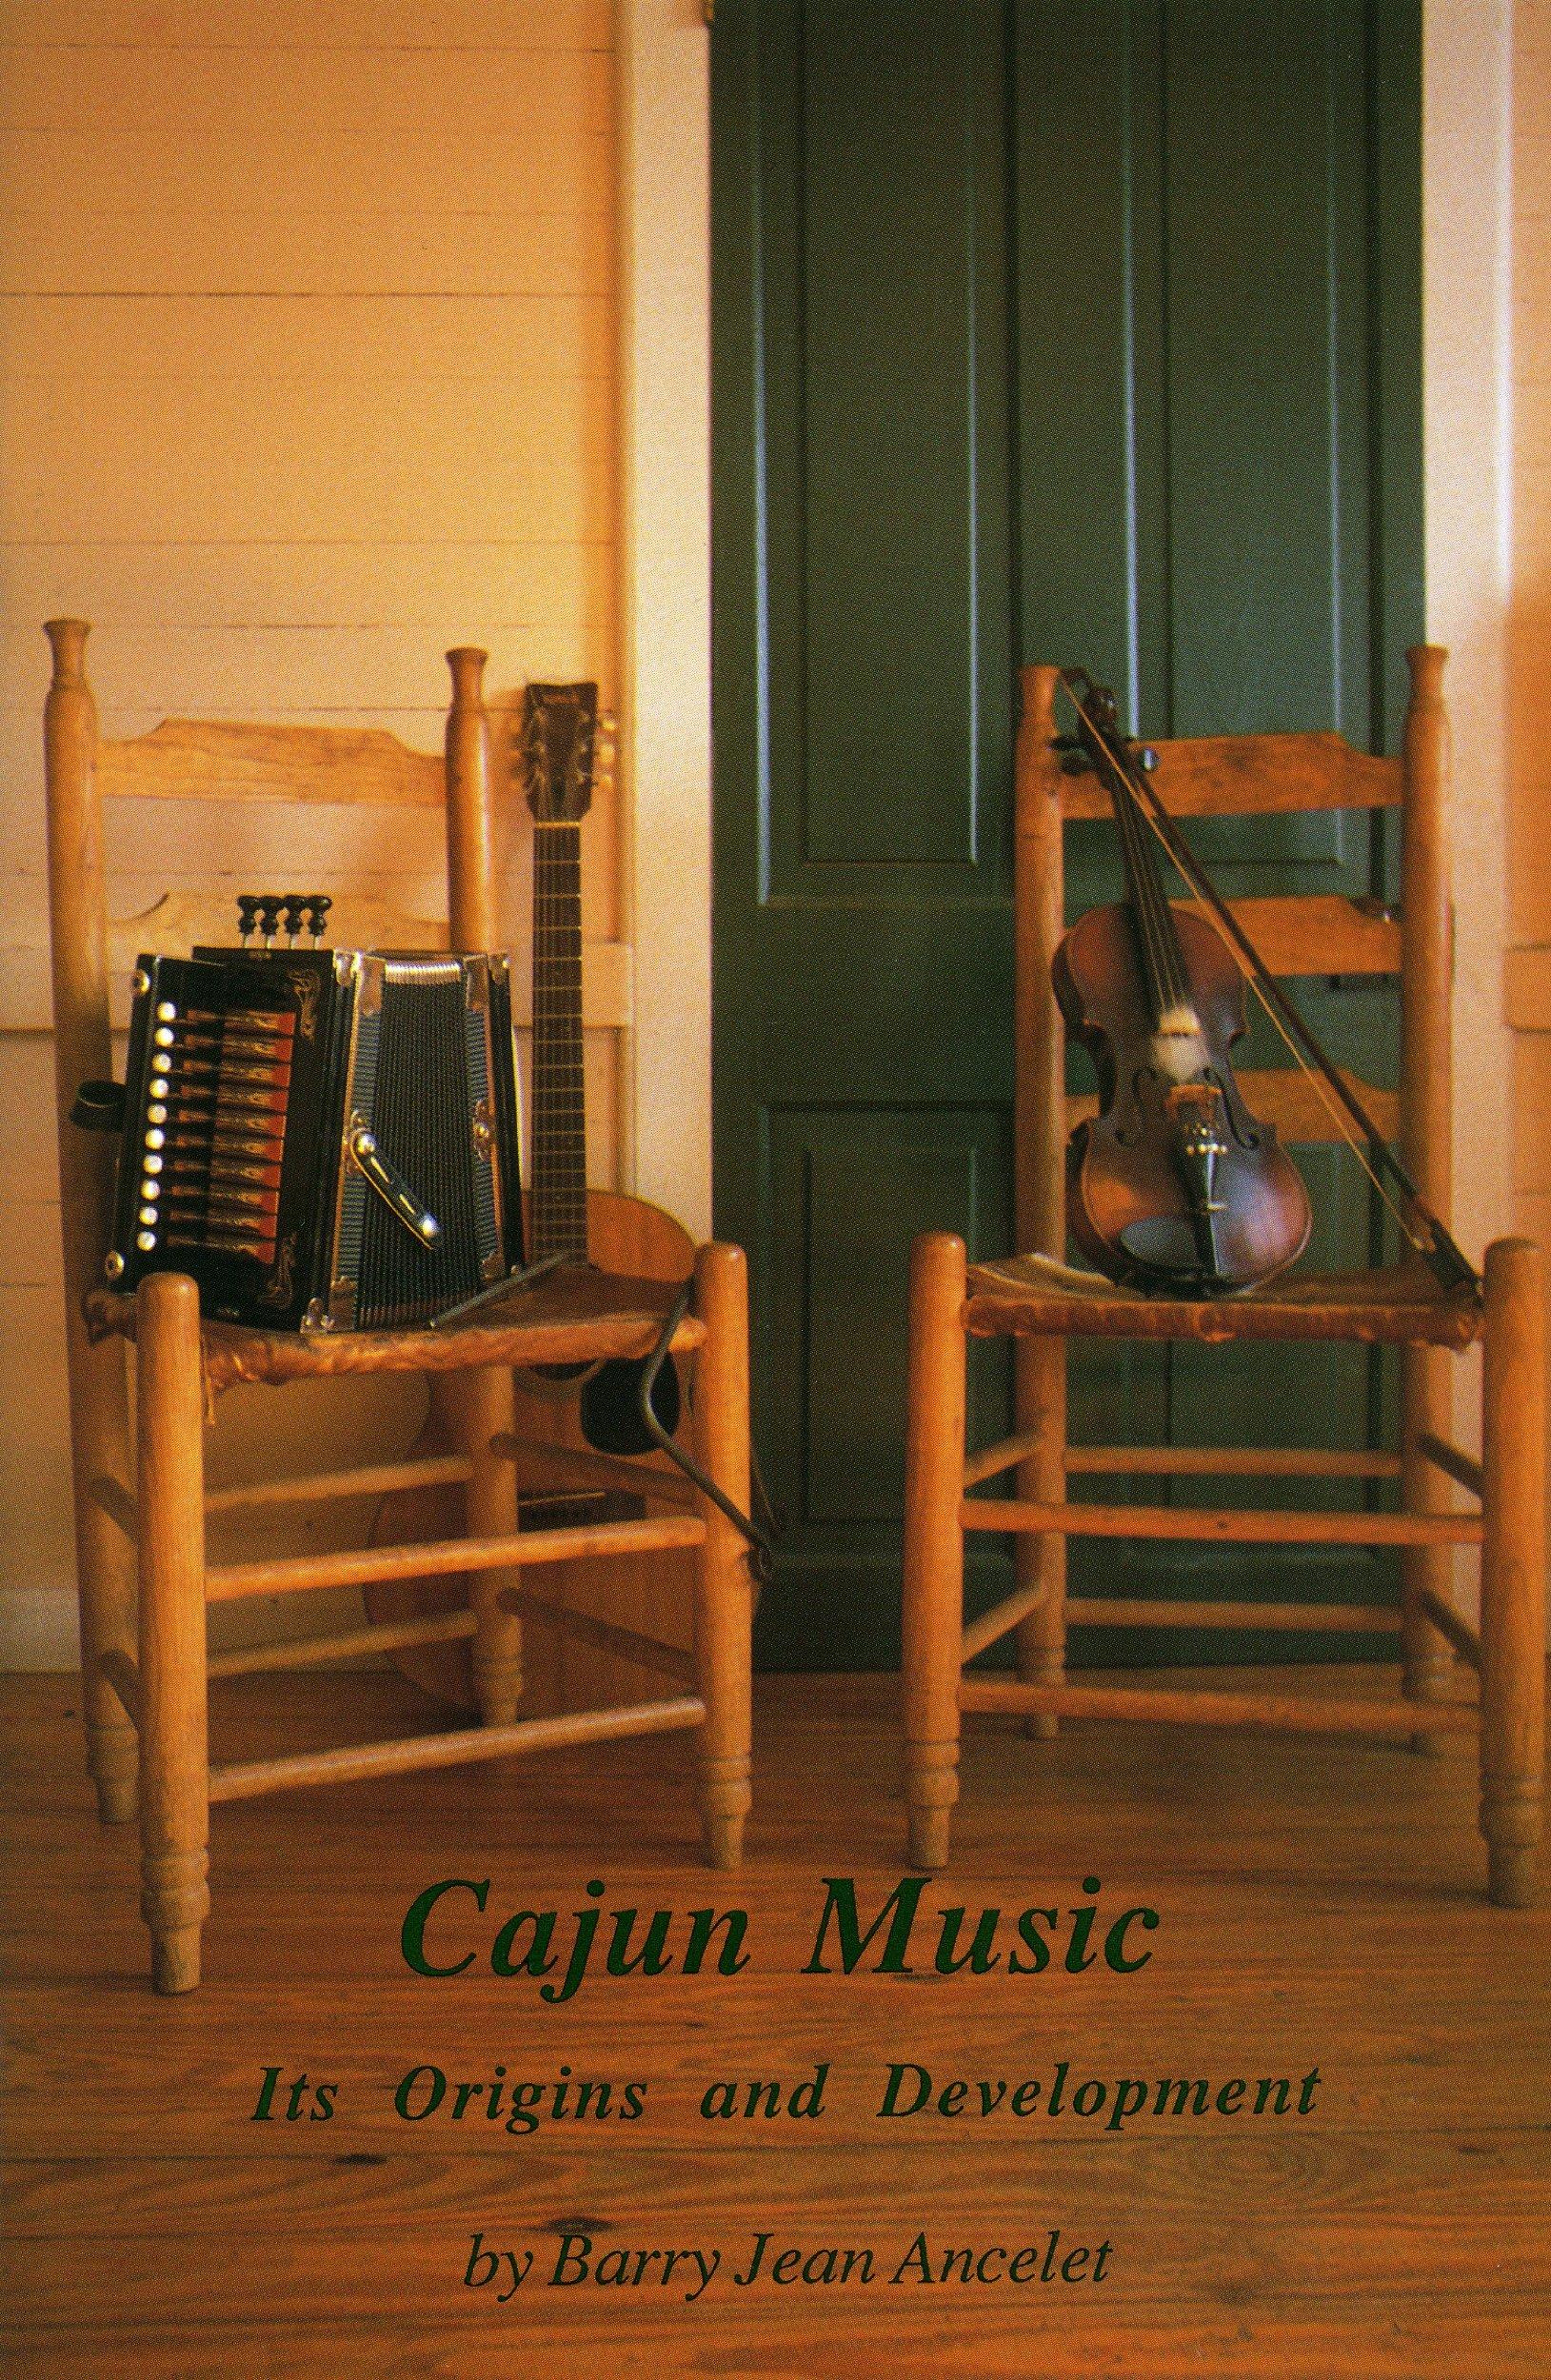 Cajun Music: Its Origins and Development (Louisiana Life Series ; No. 2)